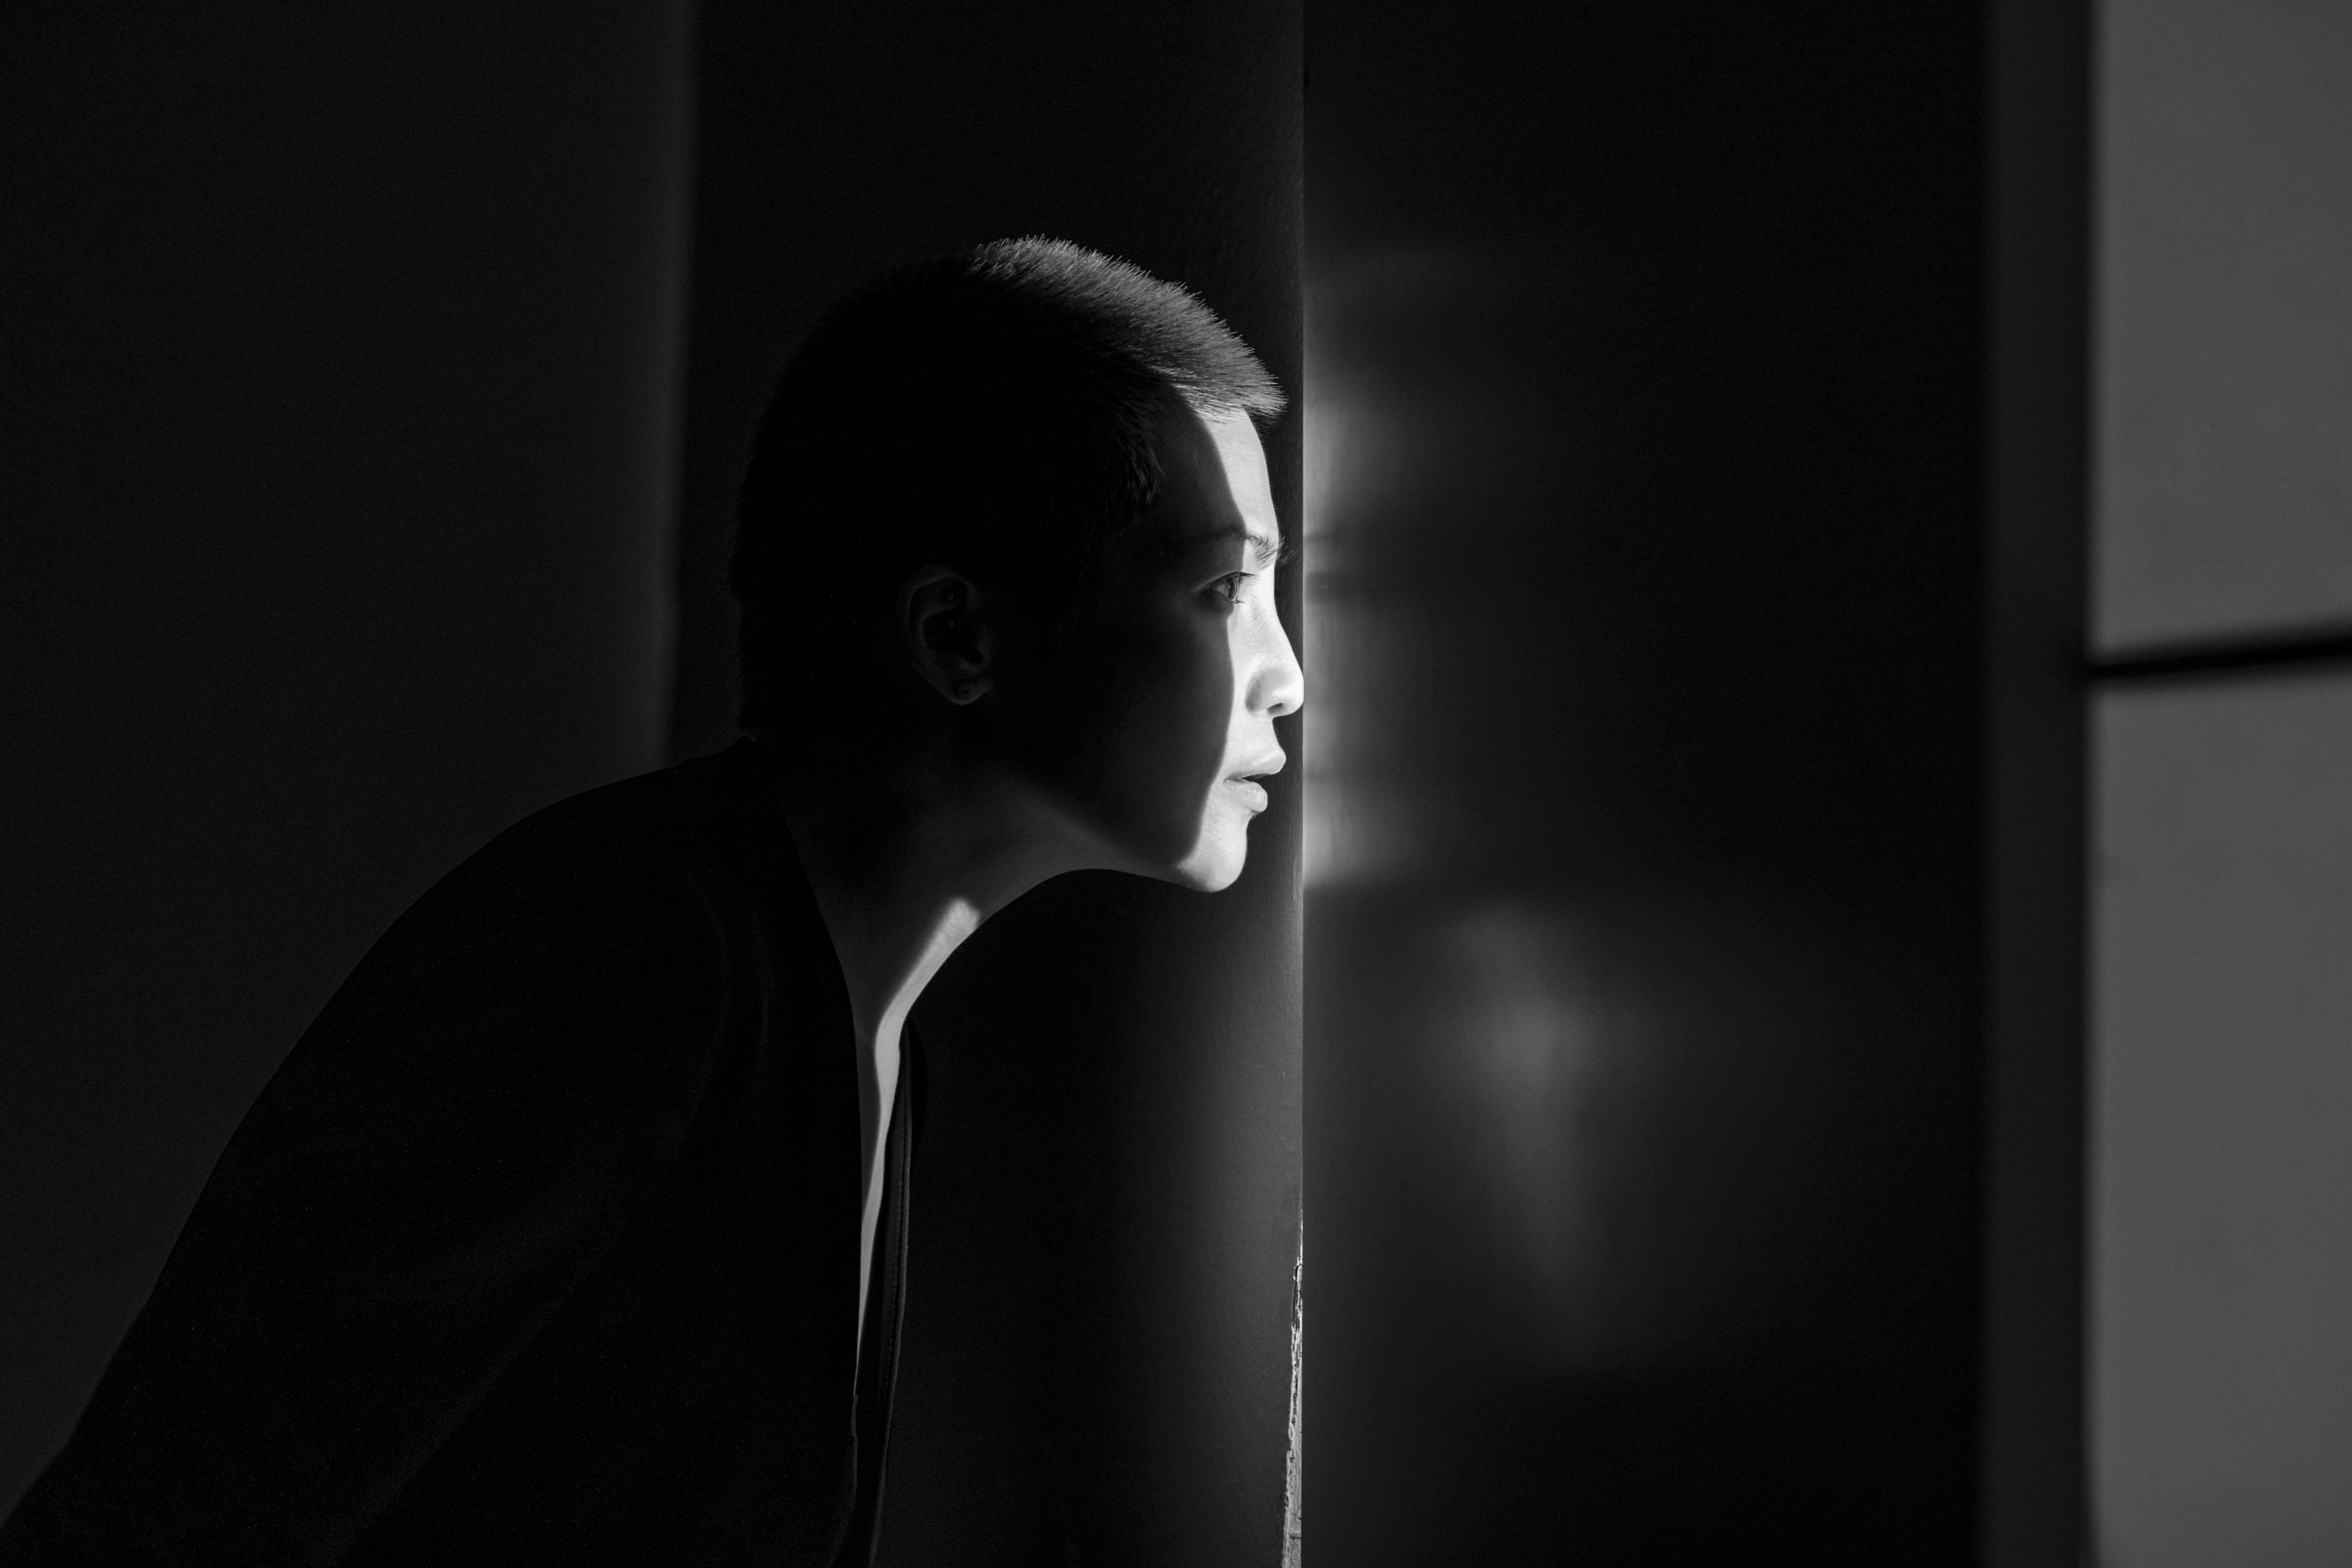 Bemoral緊密共生系列》與自己的性別共生─專訪LEZS女人國社長王安頤